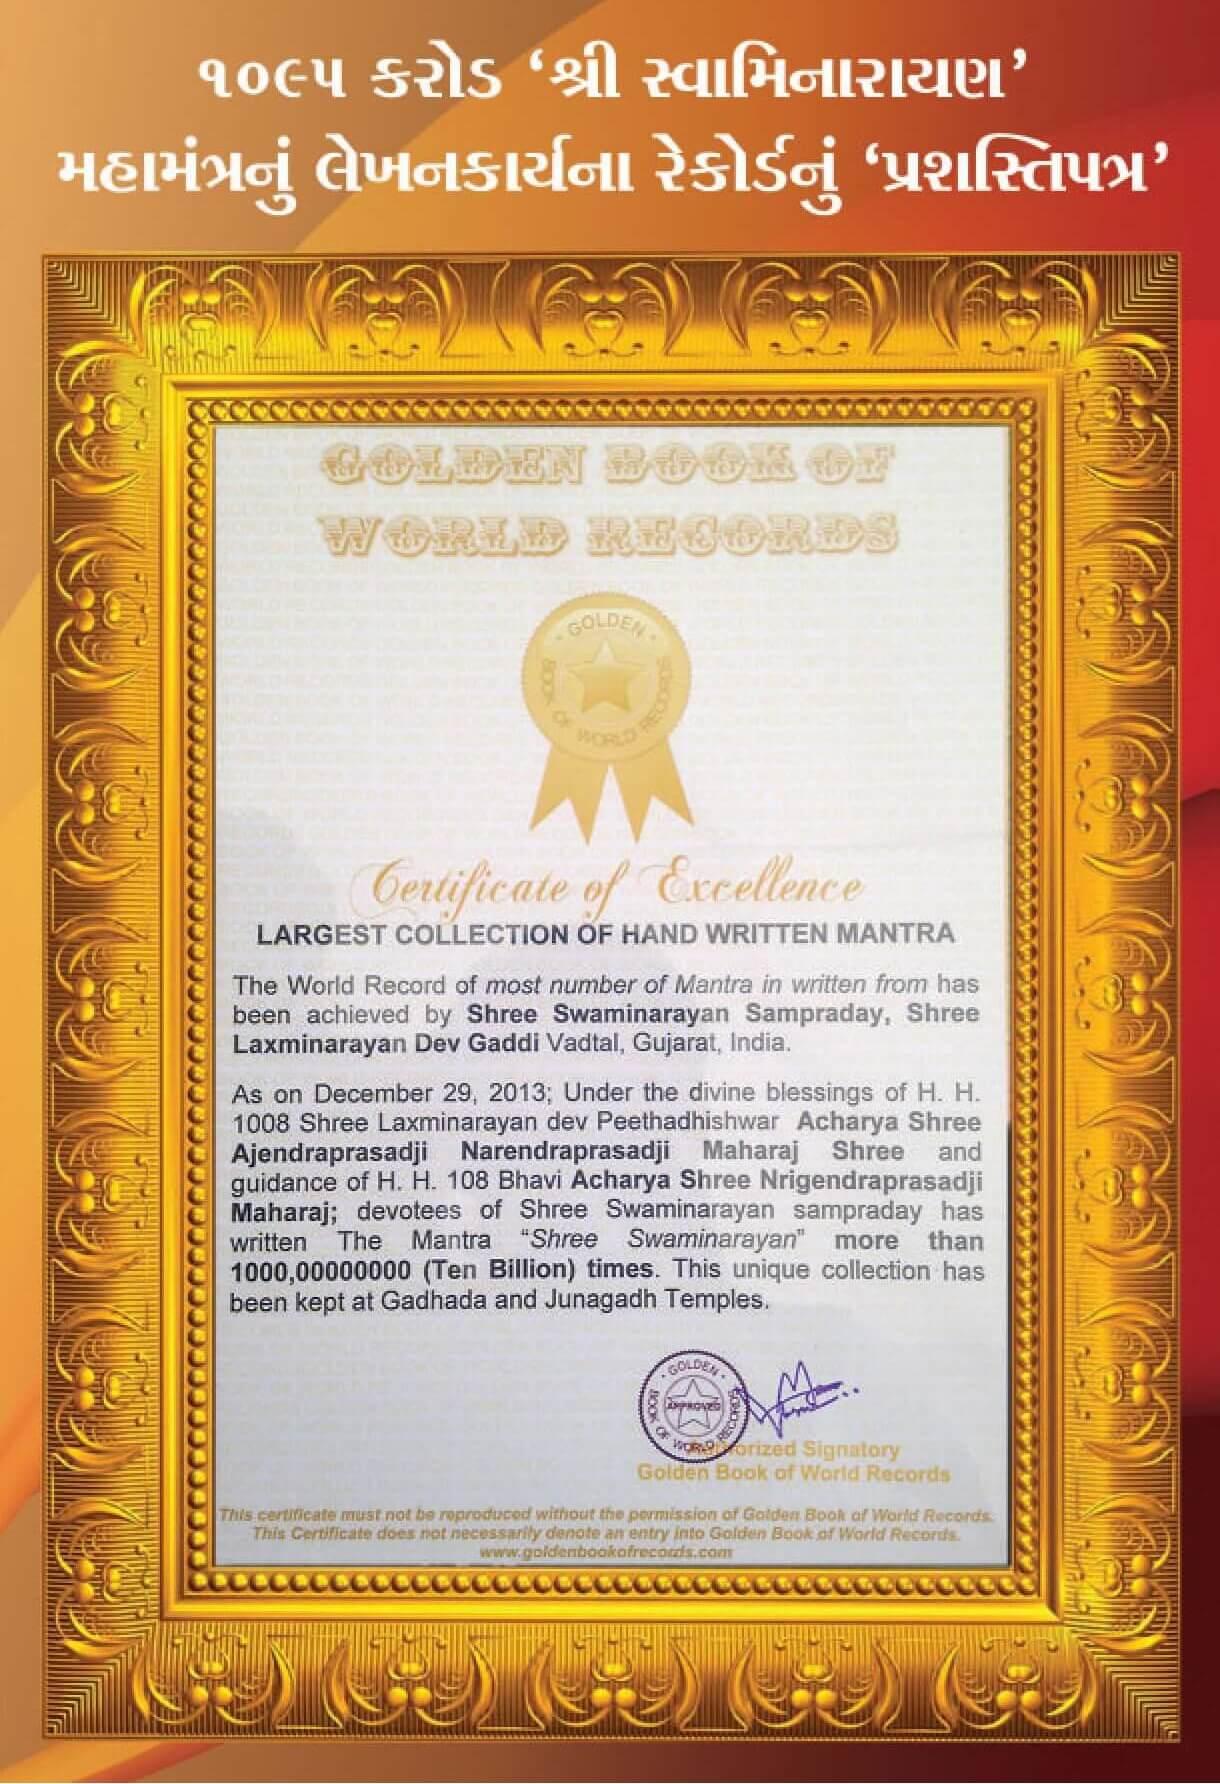 Golden Book of Records 1095 Crore Swaminarayan Mahamantra Lekhan Record